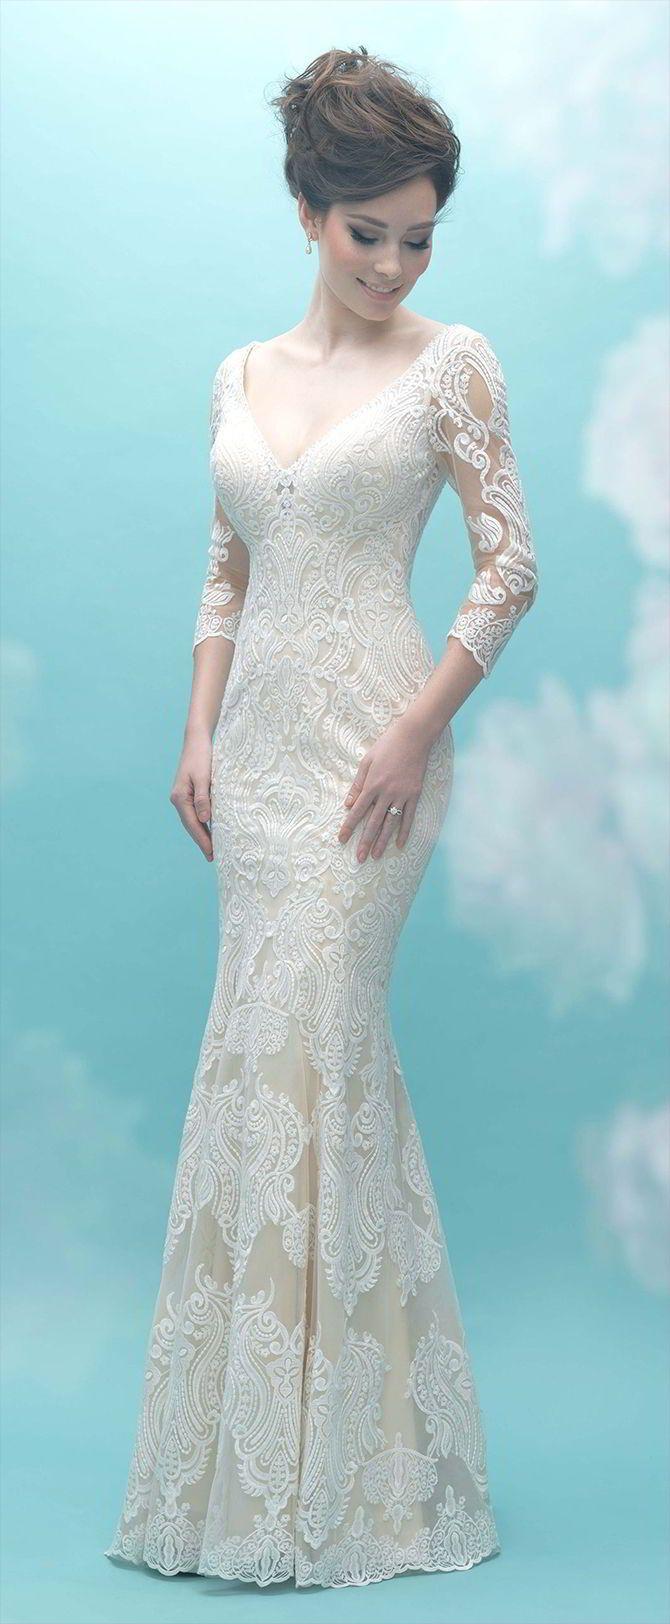 Illusion lace wedding dress  Allure Bridals Fall  Wedding Dresses  Allure bridals Wedding